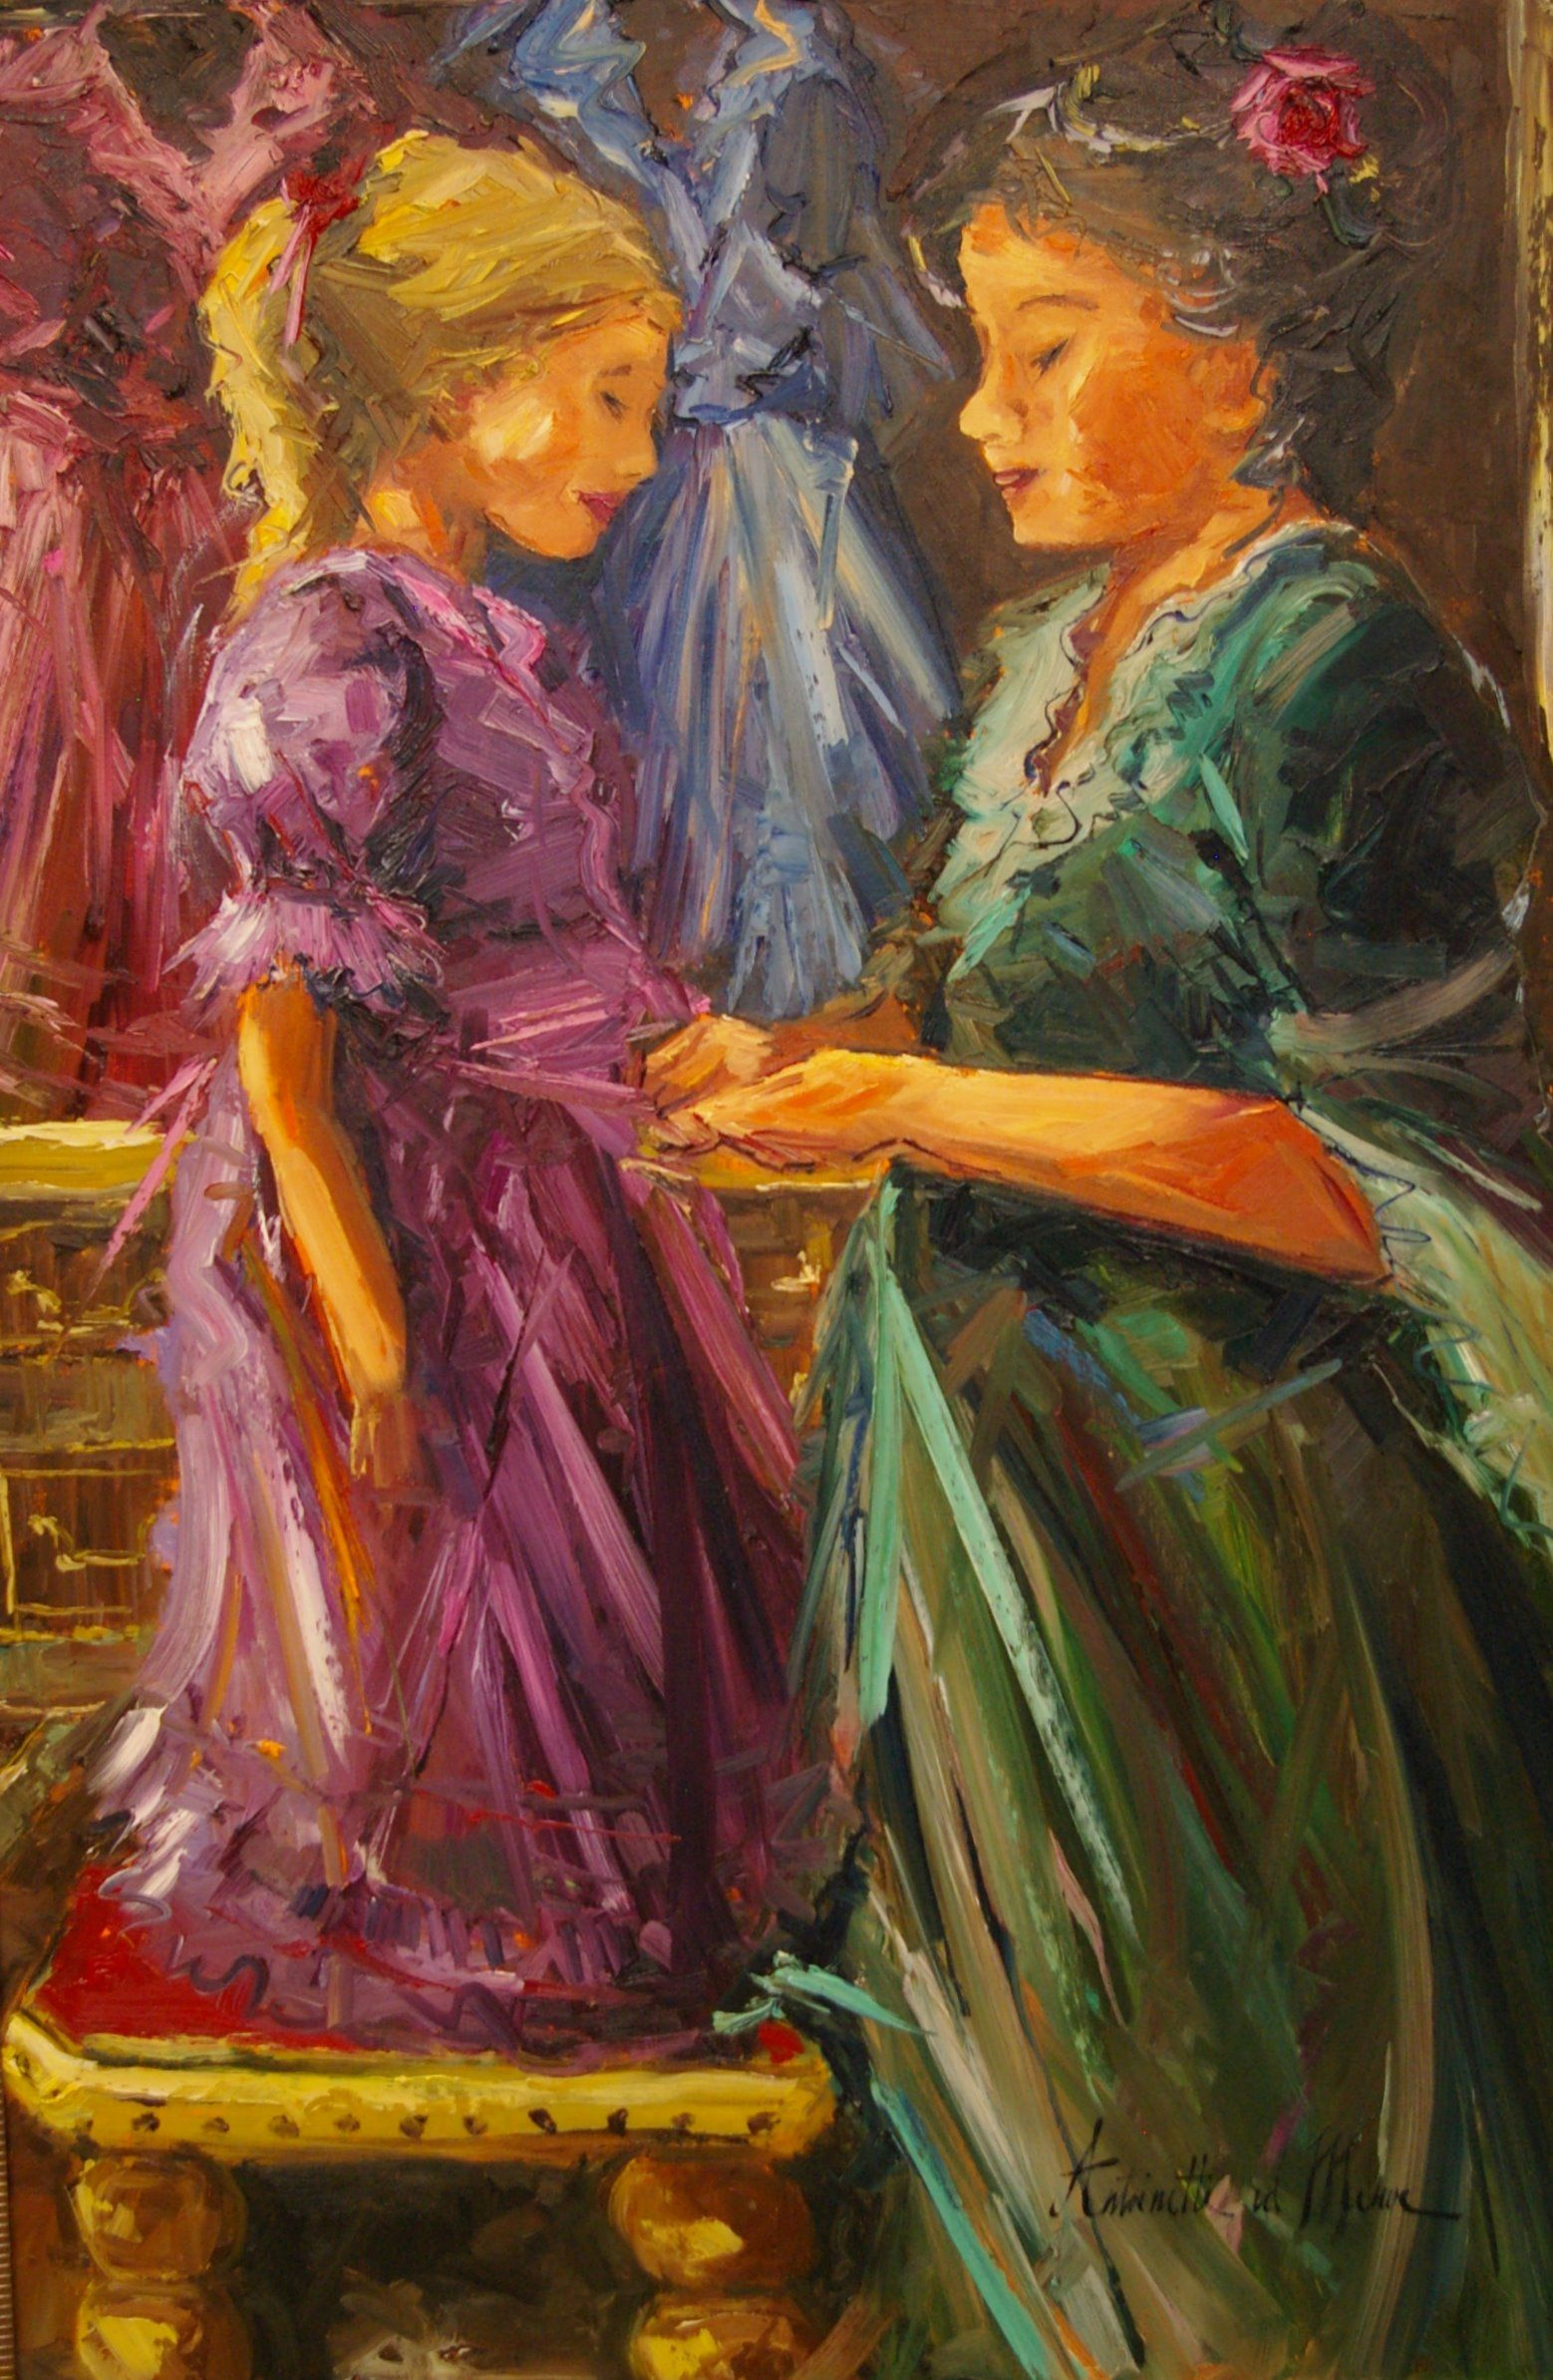 Artist: Antoinette van der Merwe  In the dress shop  Oil on canvas  Framed  Available